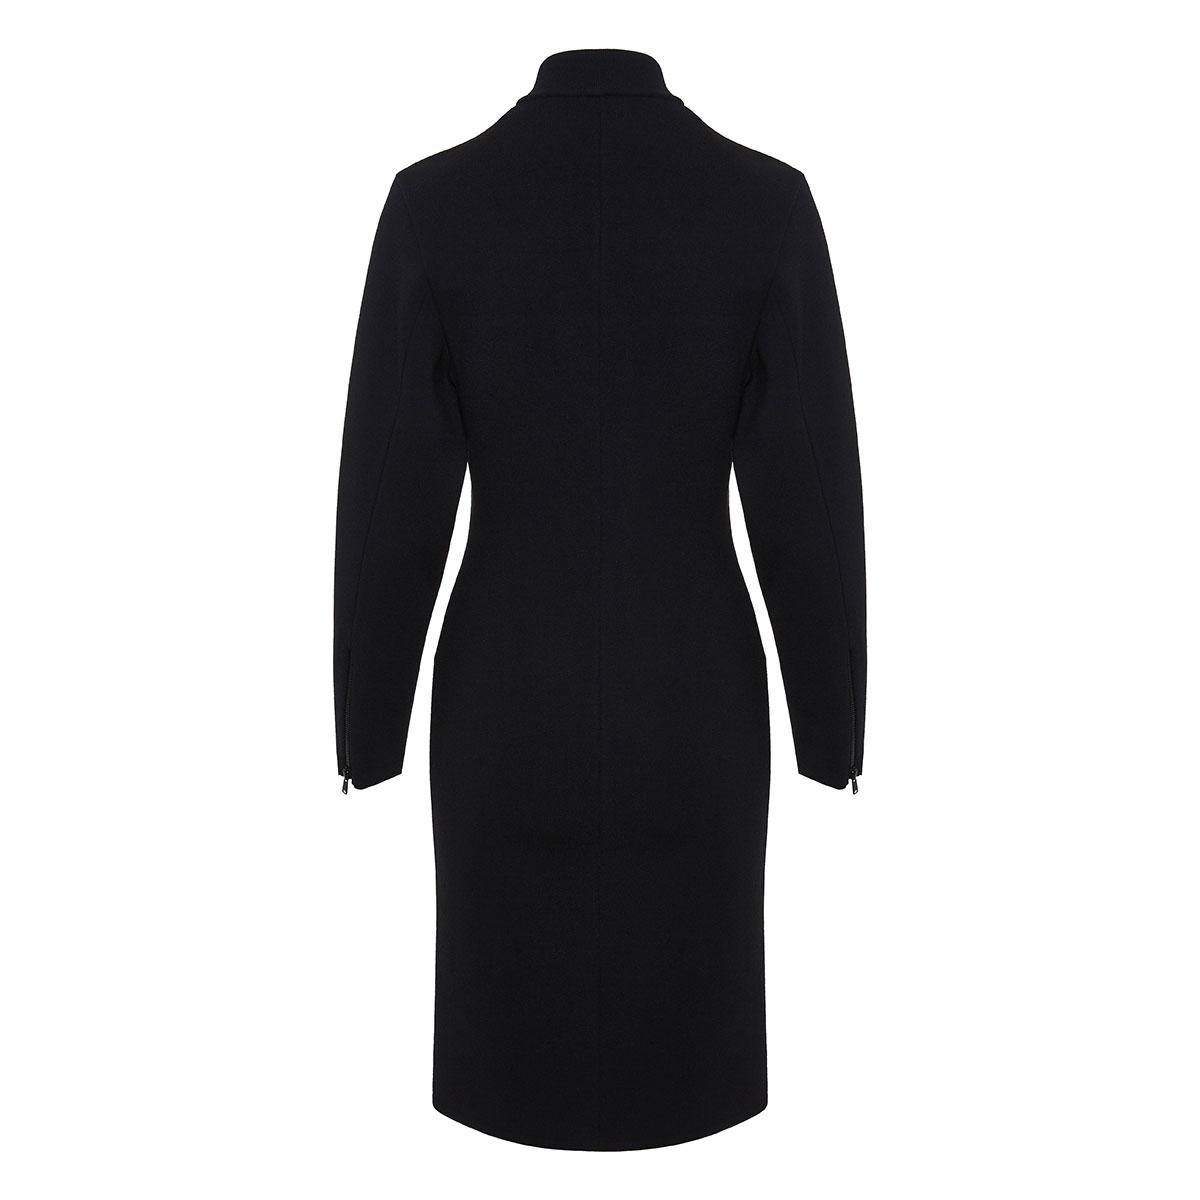 Wool zipper dress